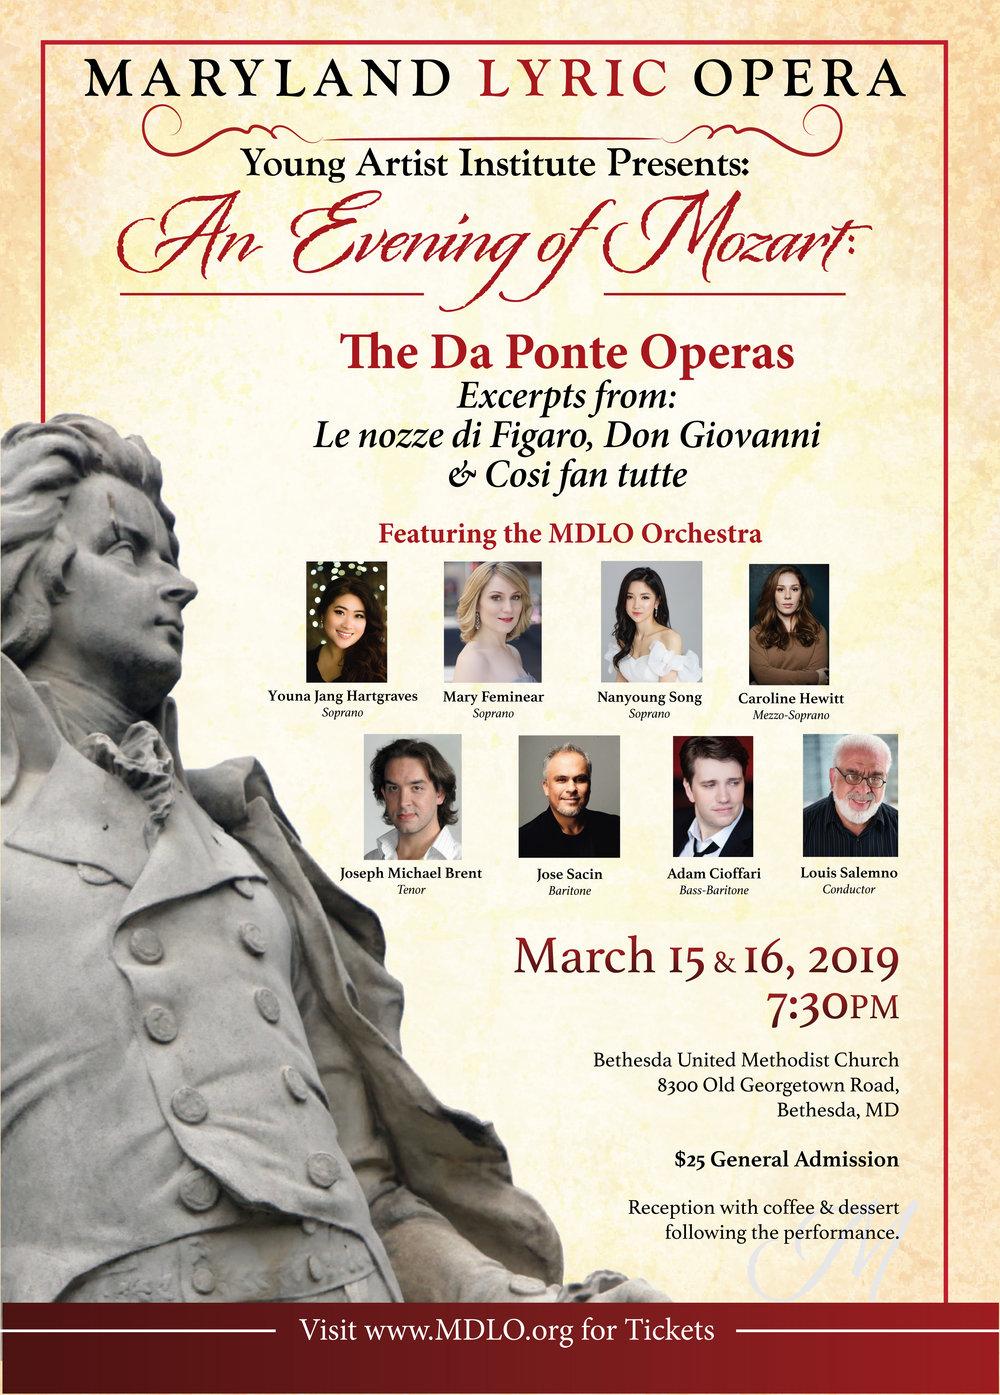 Mozart Institute Poster March 2019.jpg